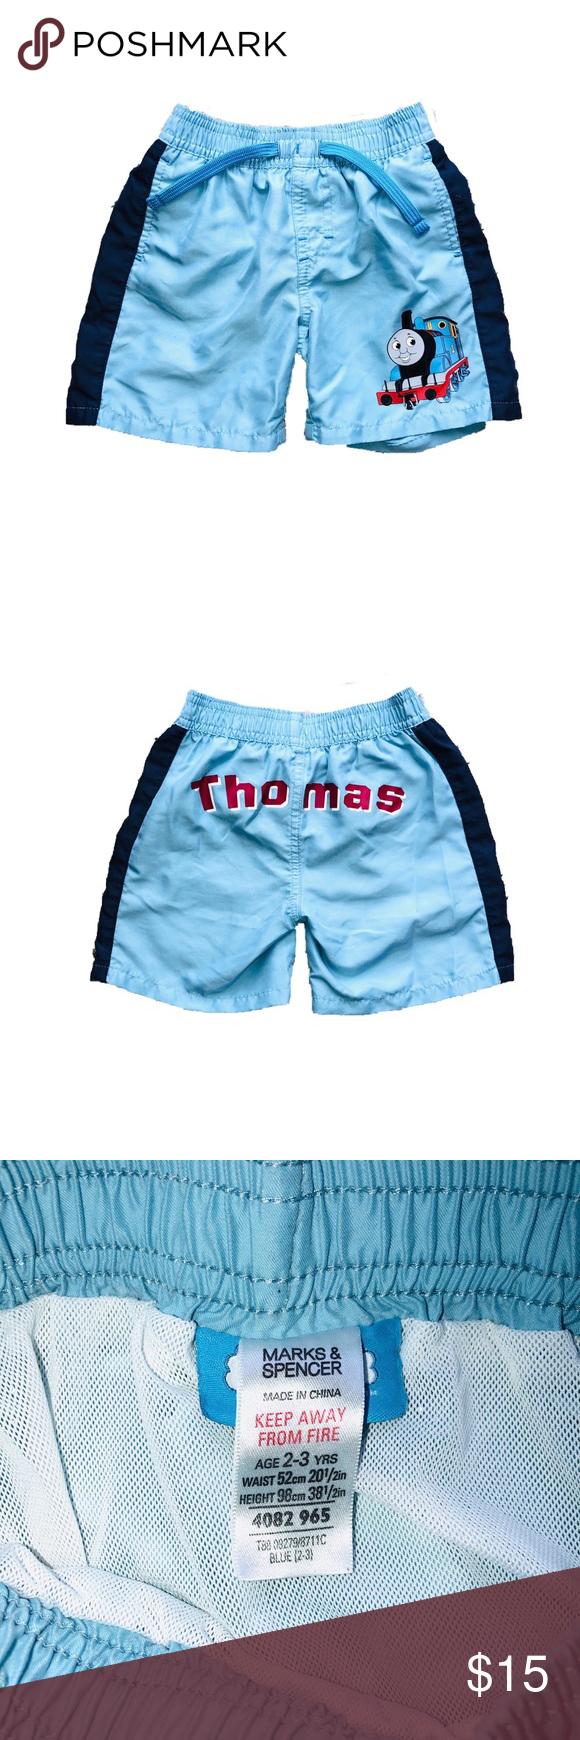 b56b75b779 Boys swimming trunks 2t-3t Thomas the train swimming trunks Swim Swim Trunks